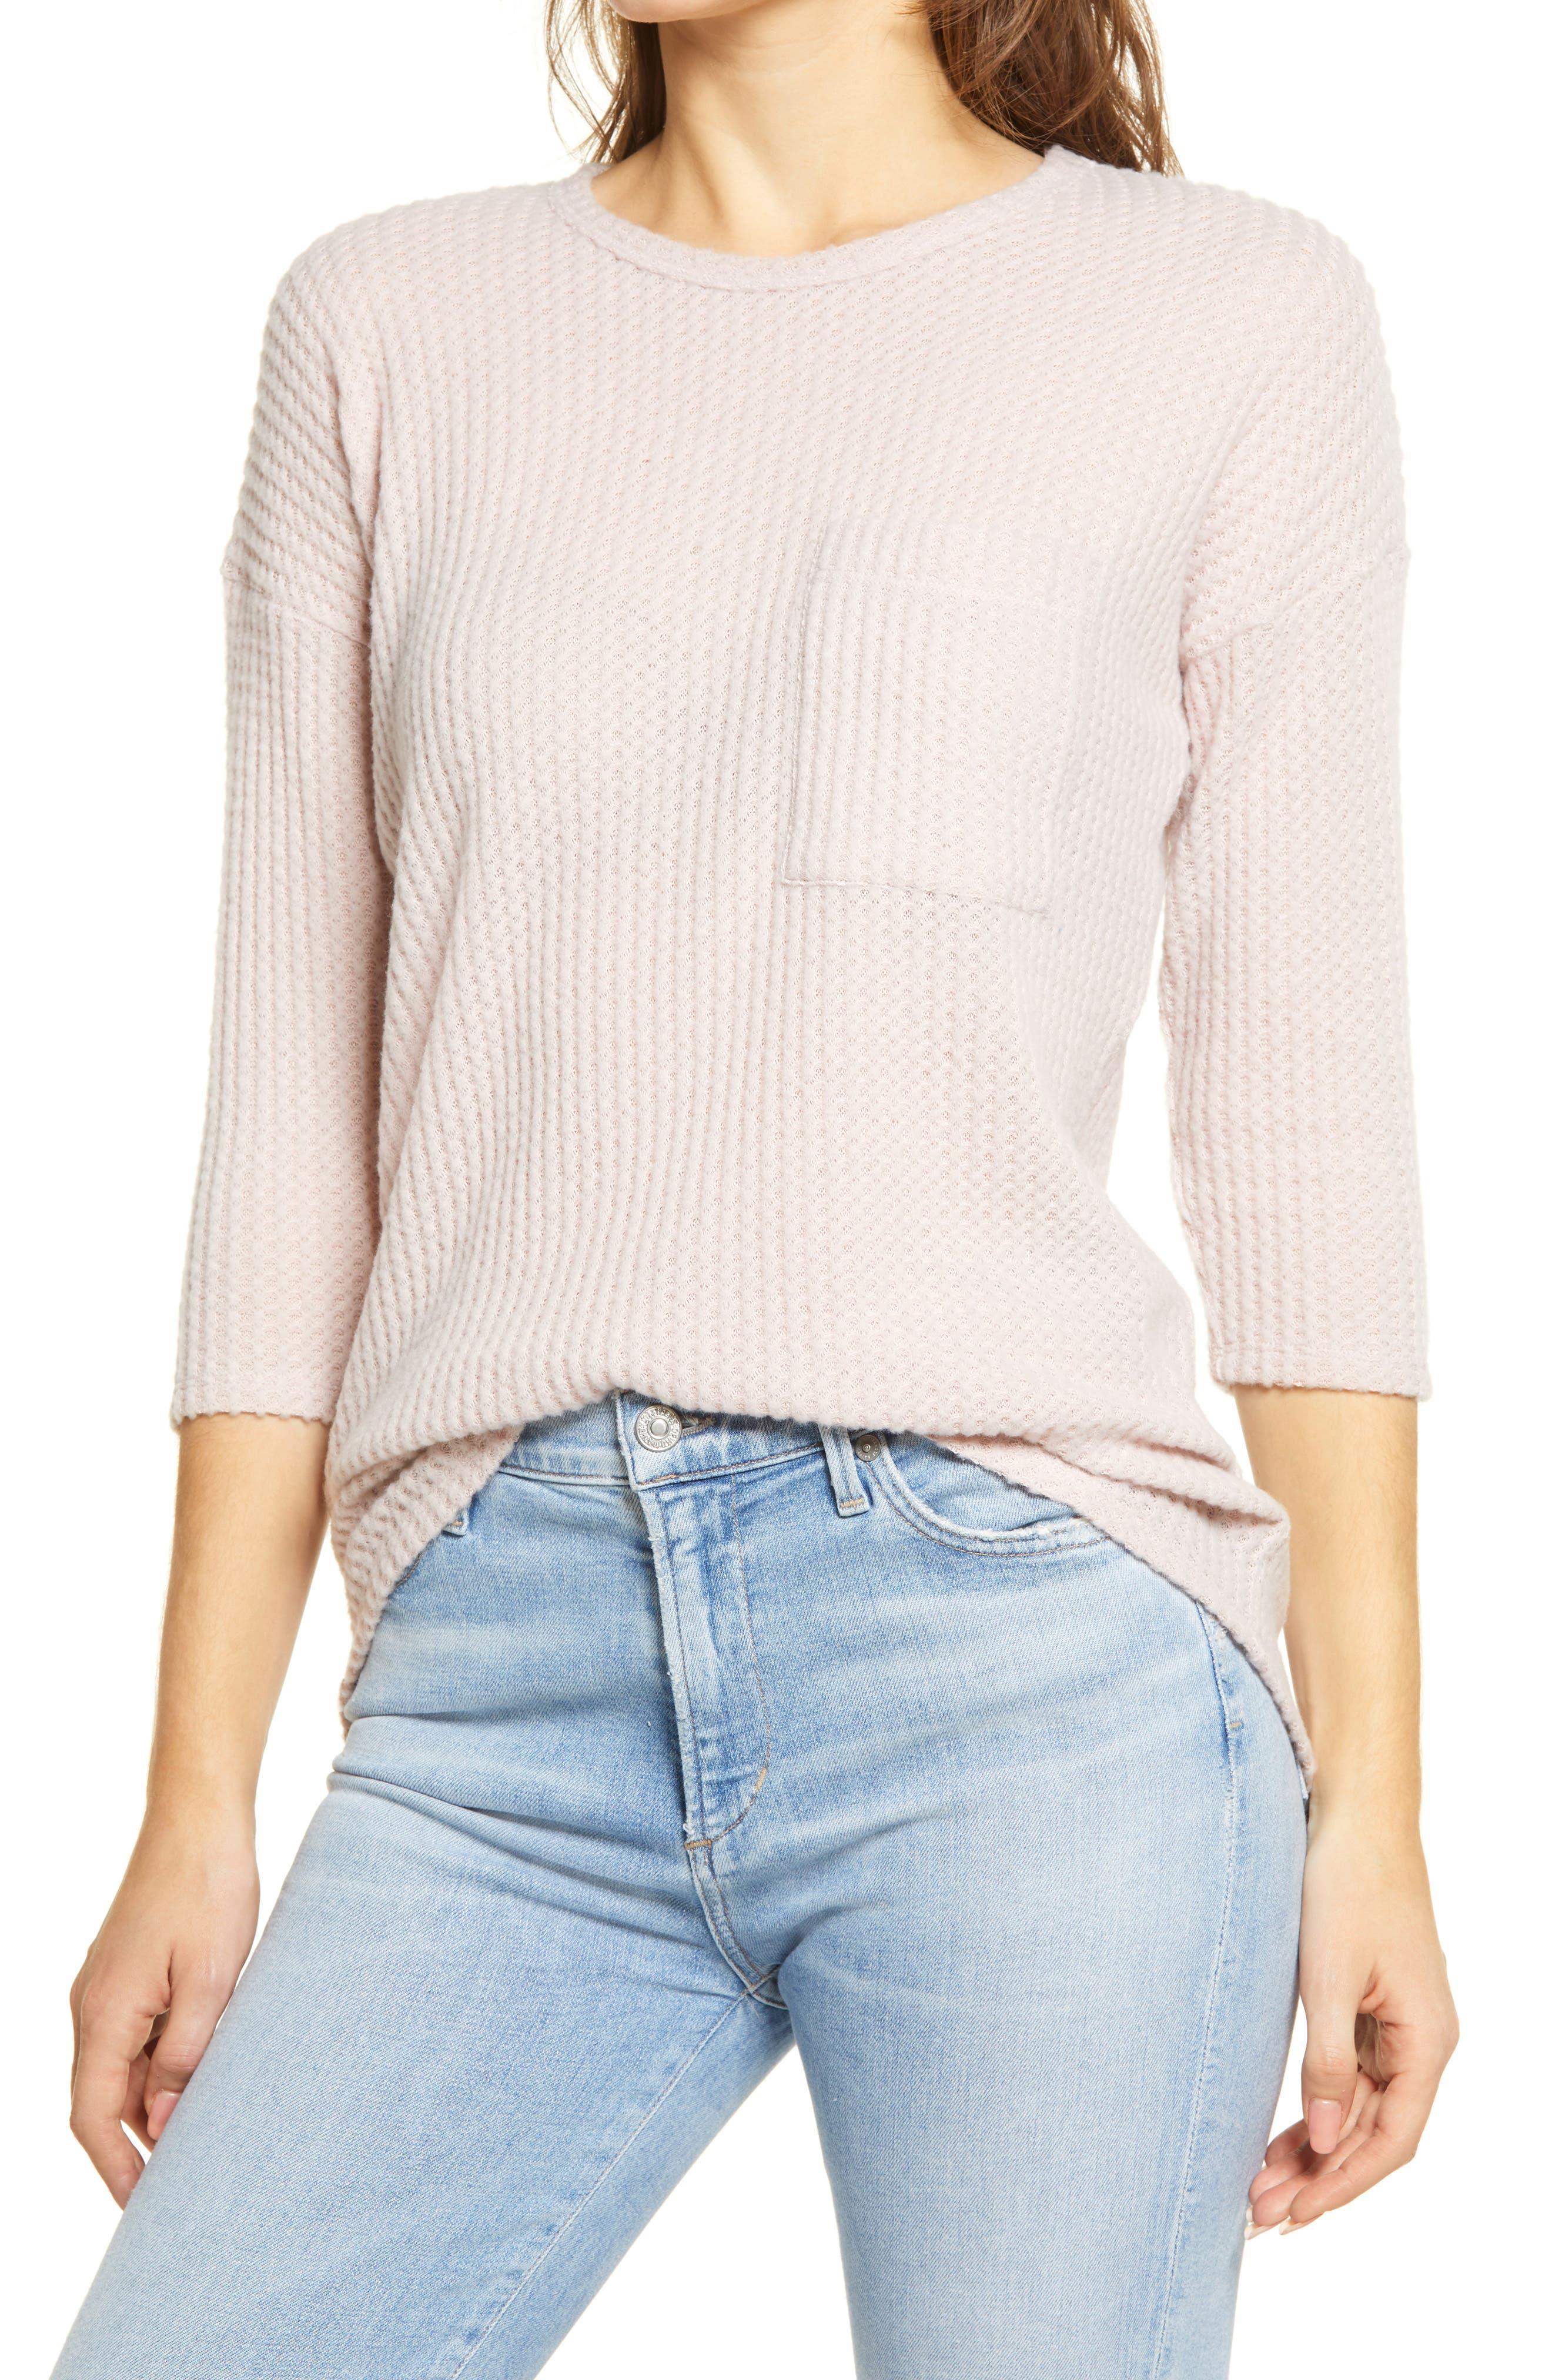 Andrew Marc NEW Beautiful Neutral multi Pleated Neckline Blouse Women/'s M L XL